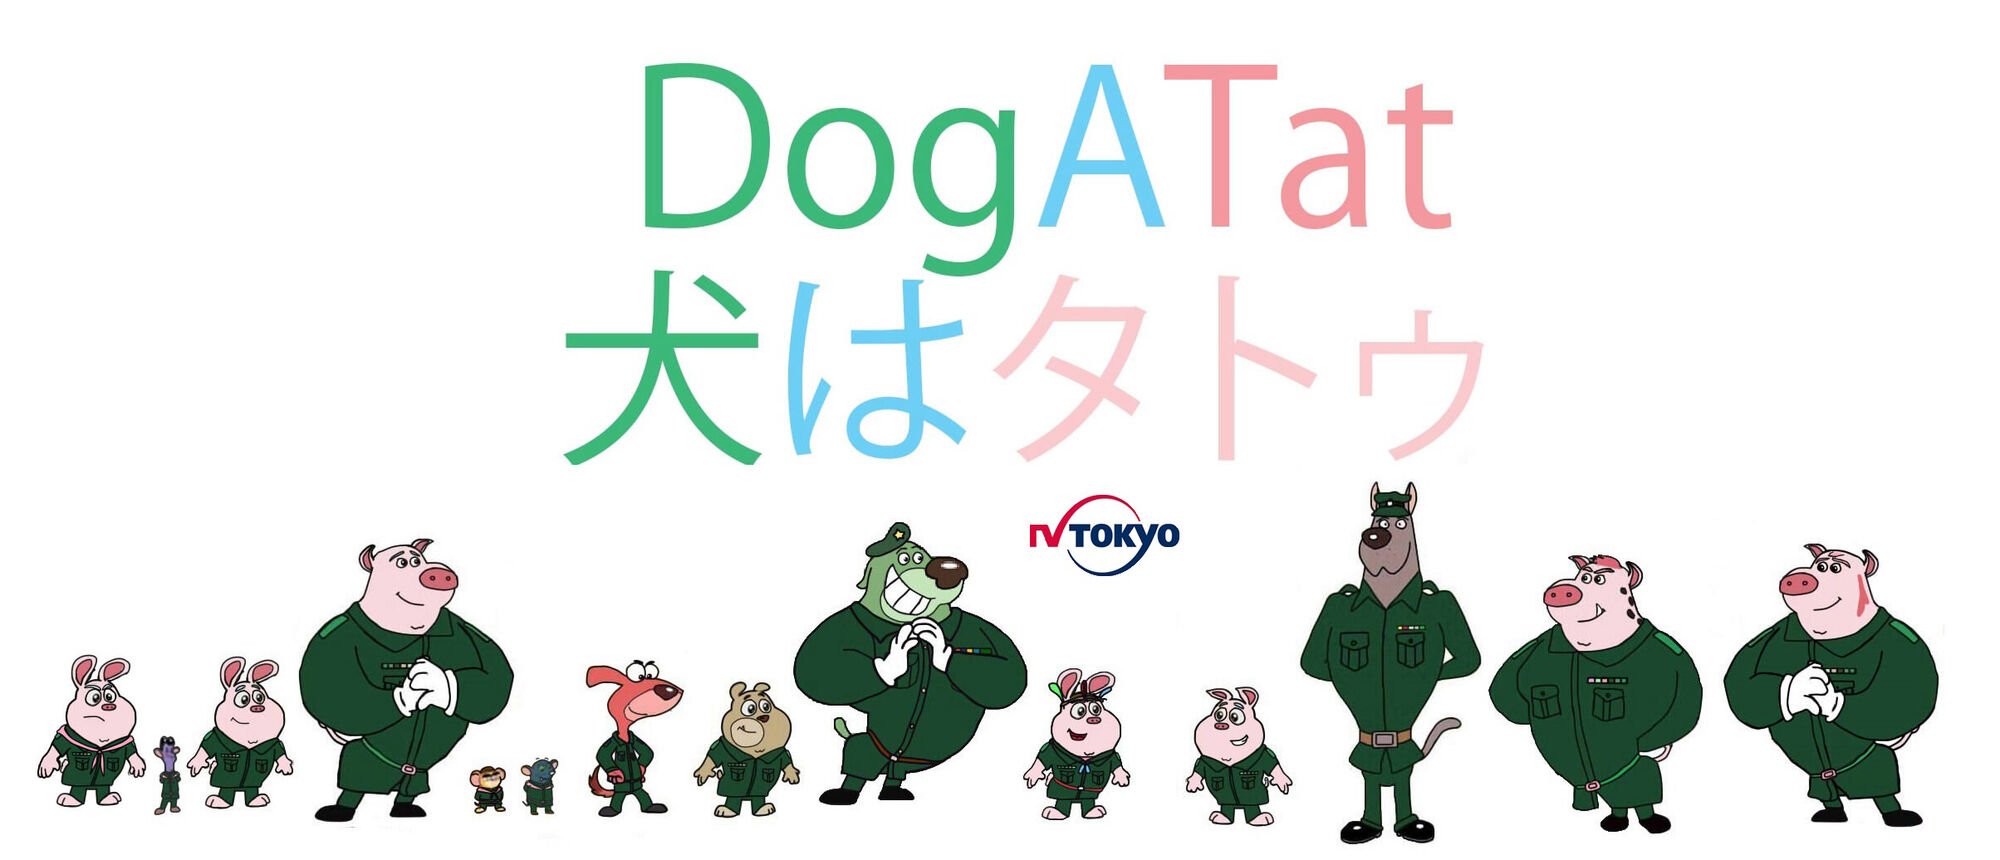 Image - Dog A Tat Inu wa tato~ū donnie danner donnie joy donnie ...